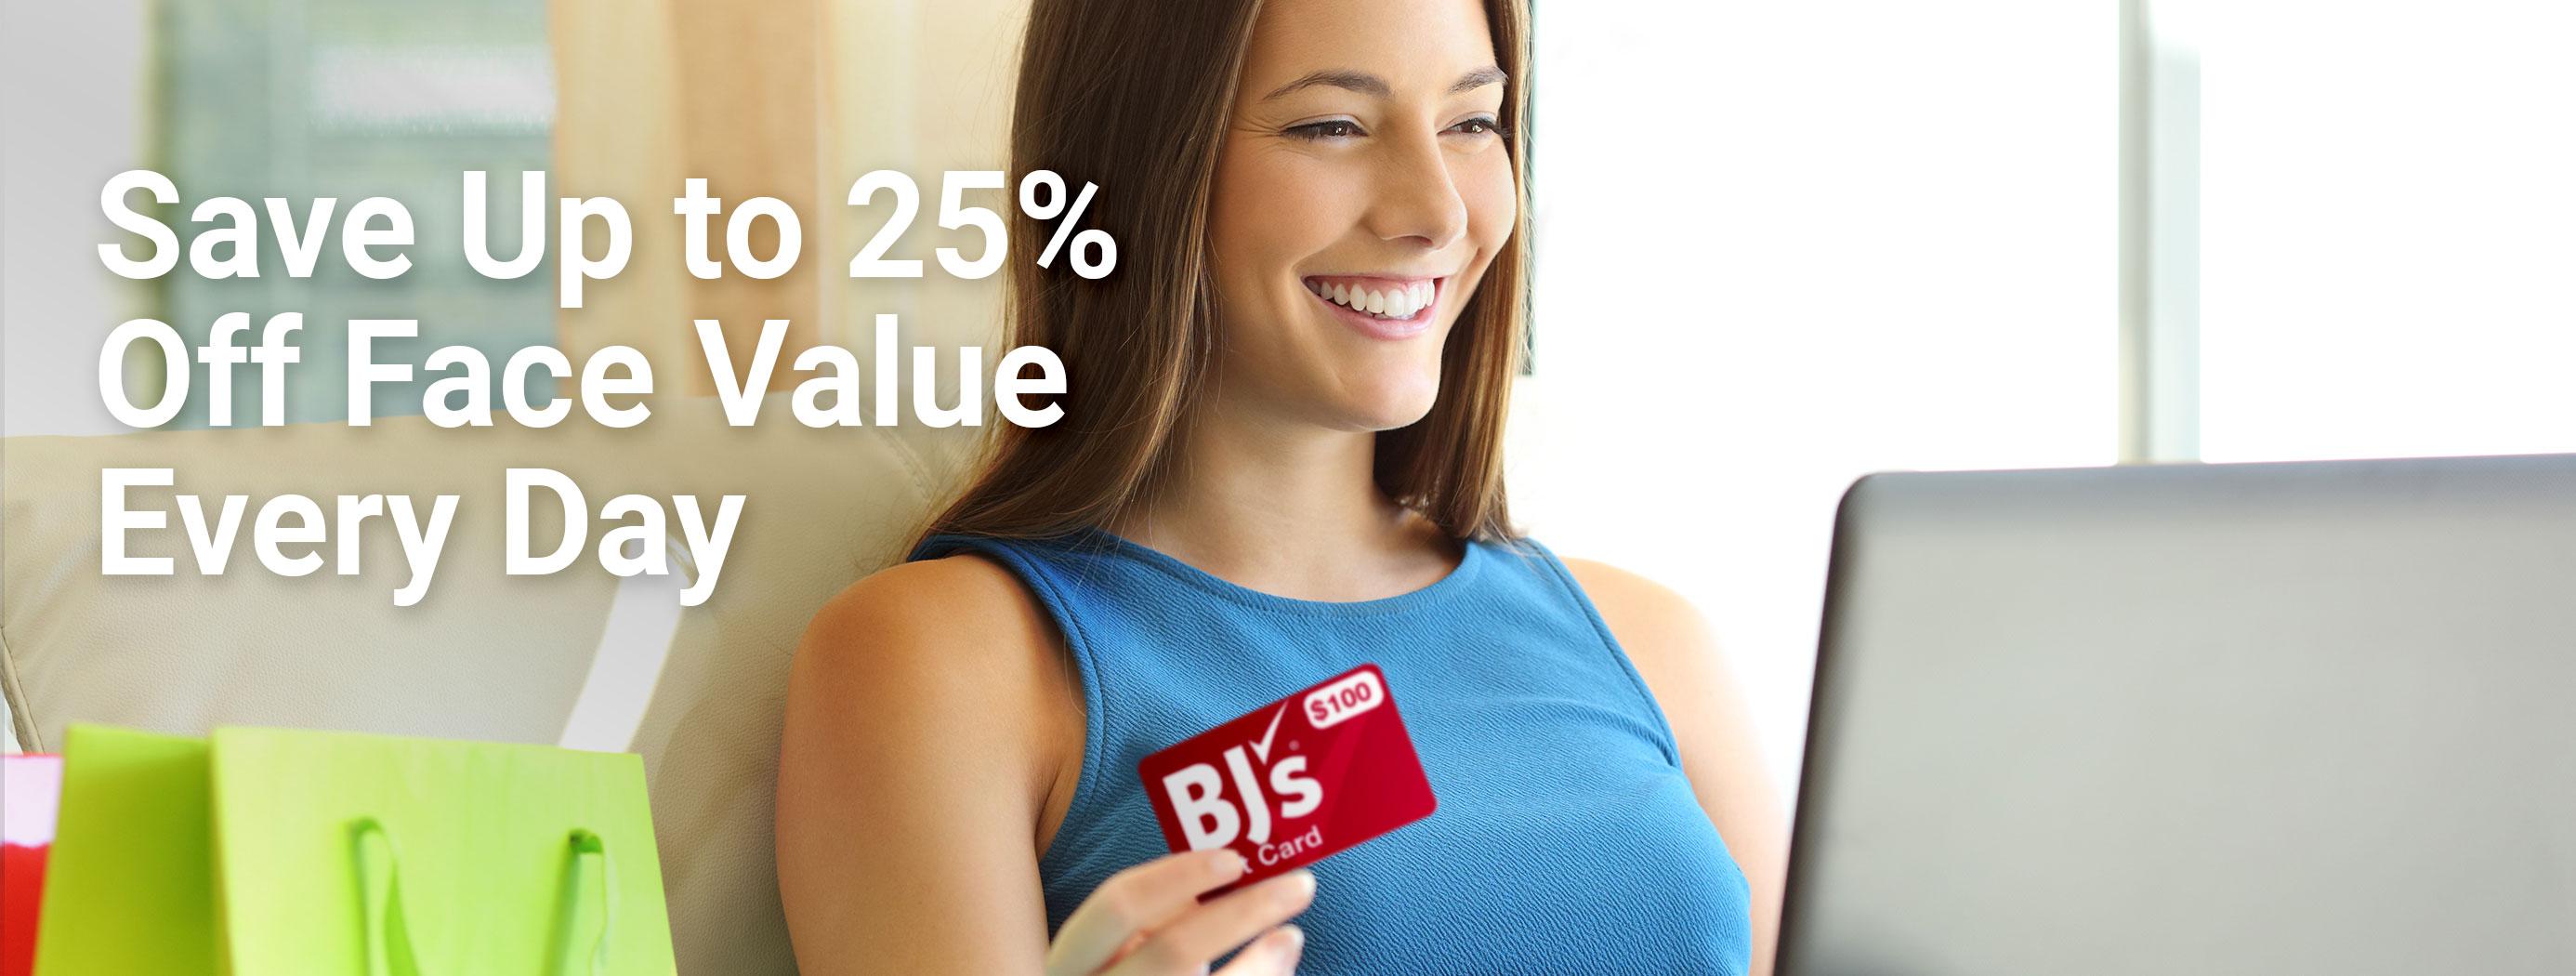 37c5773143 Order Gift Cards Online - BJS Wholesale Club